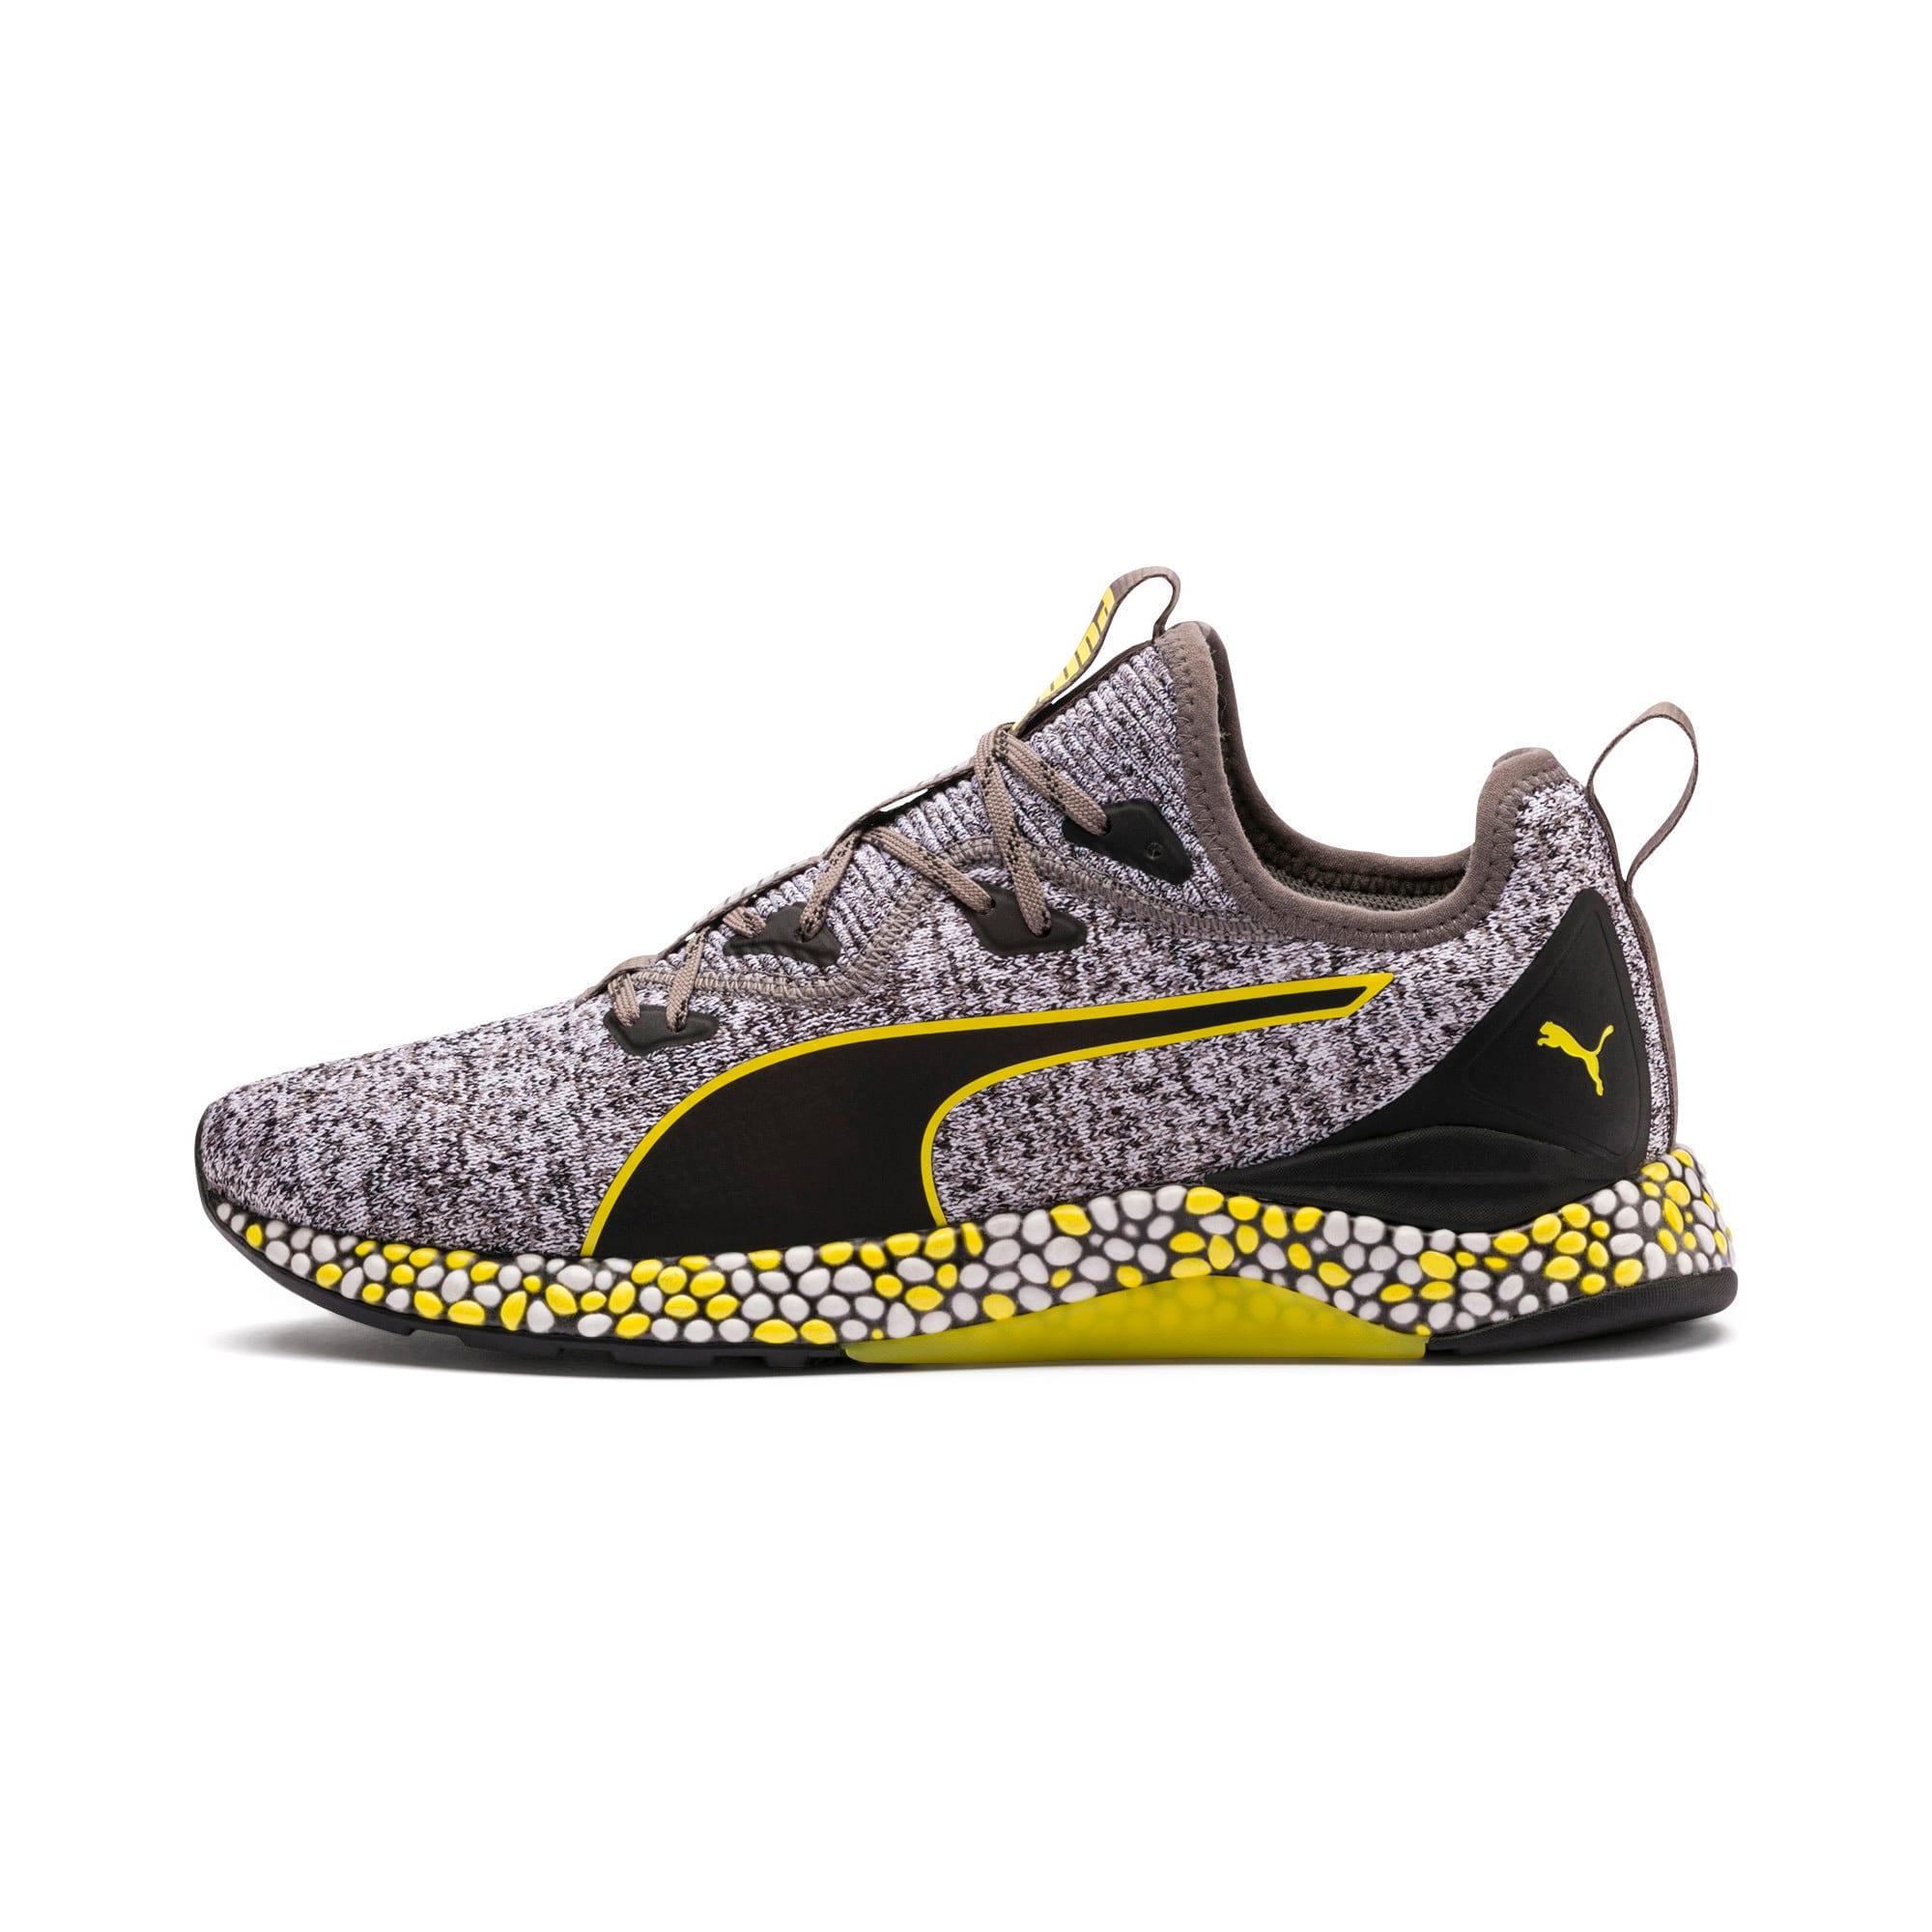 Thumbnail 1 of Hybrid Runner Men's Running Shoes, Black-White-Blazing Yellow, medium